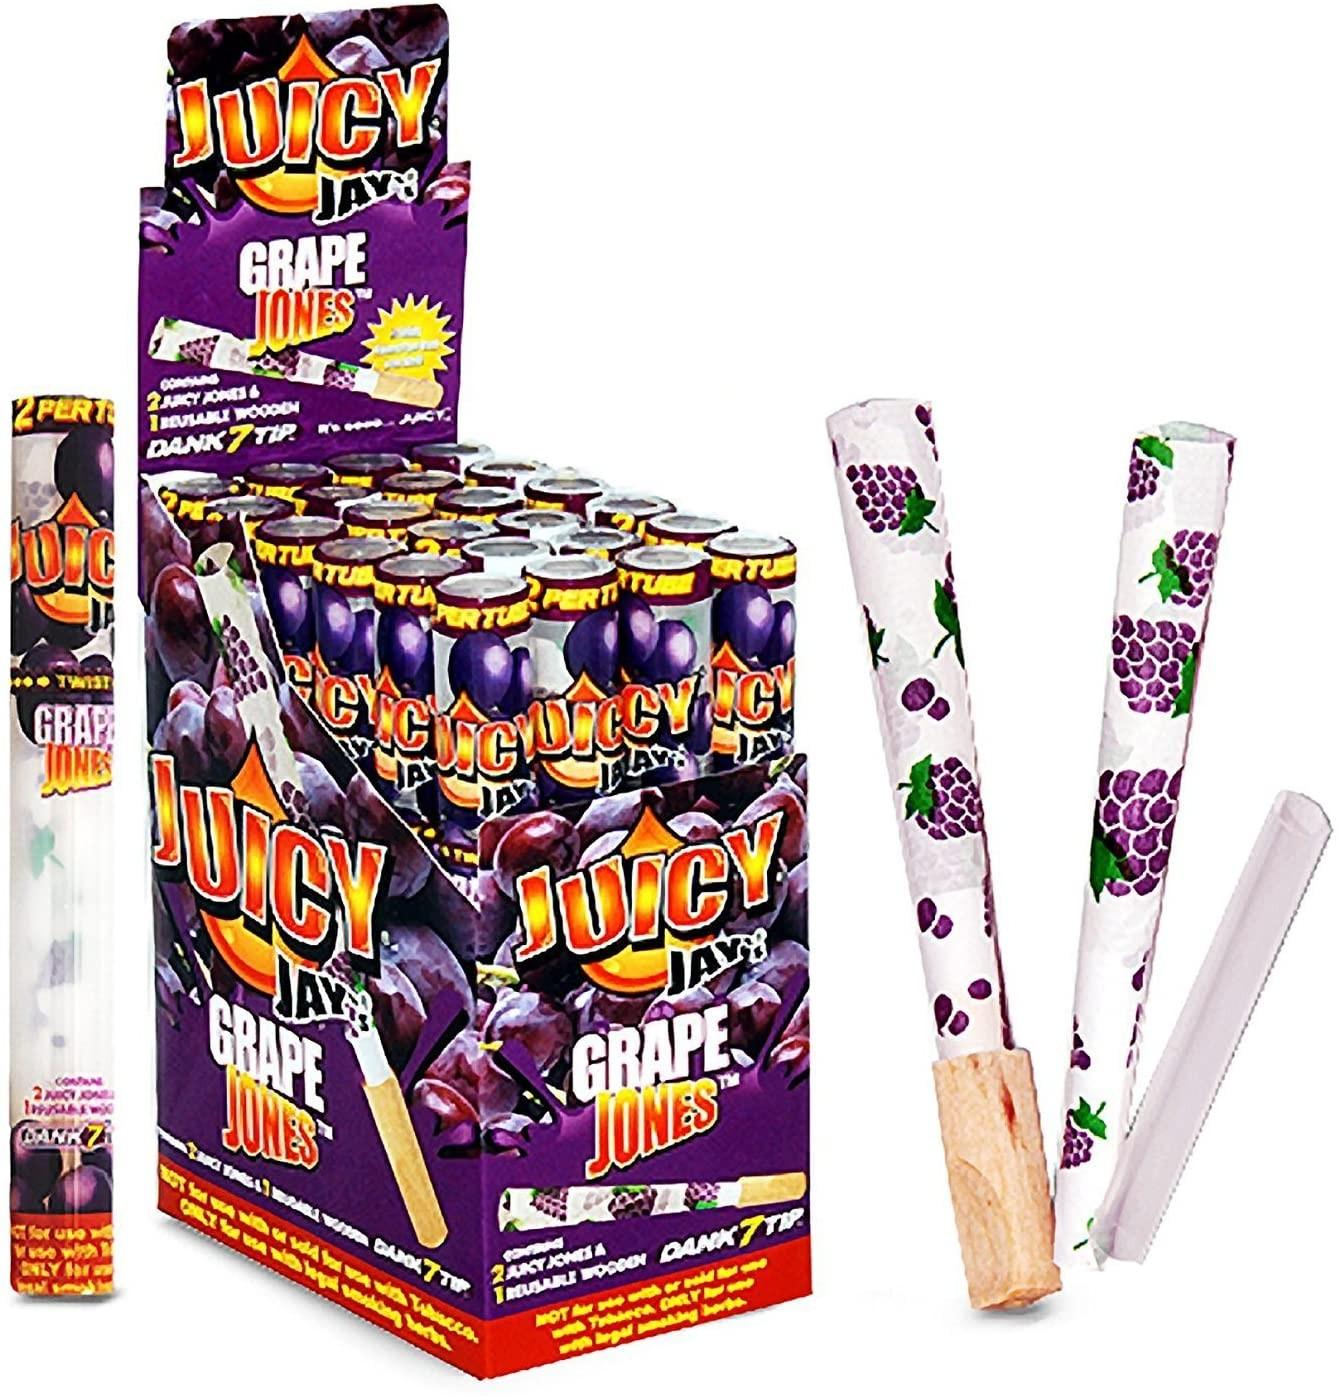 Juicy Jay Jones Grape